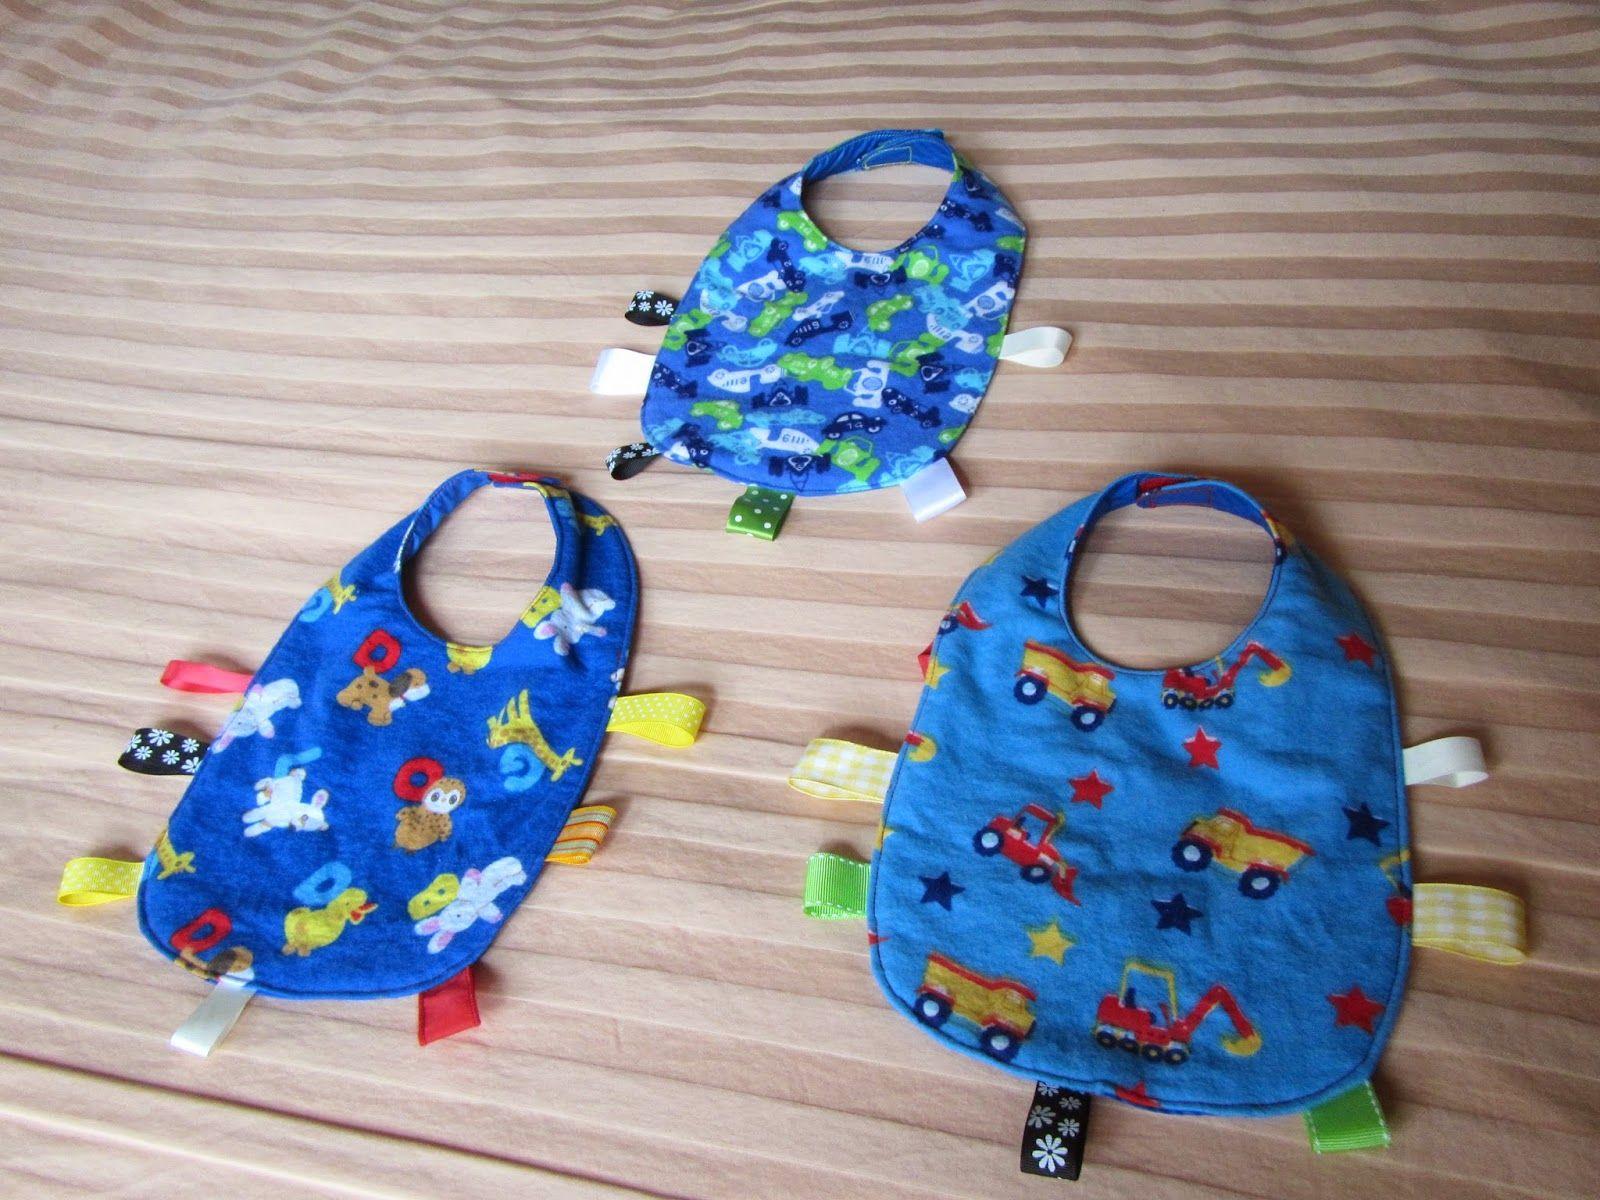 Tammy's Craft Emporium: Baby bib tutorial - a quick easy baby gift.